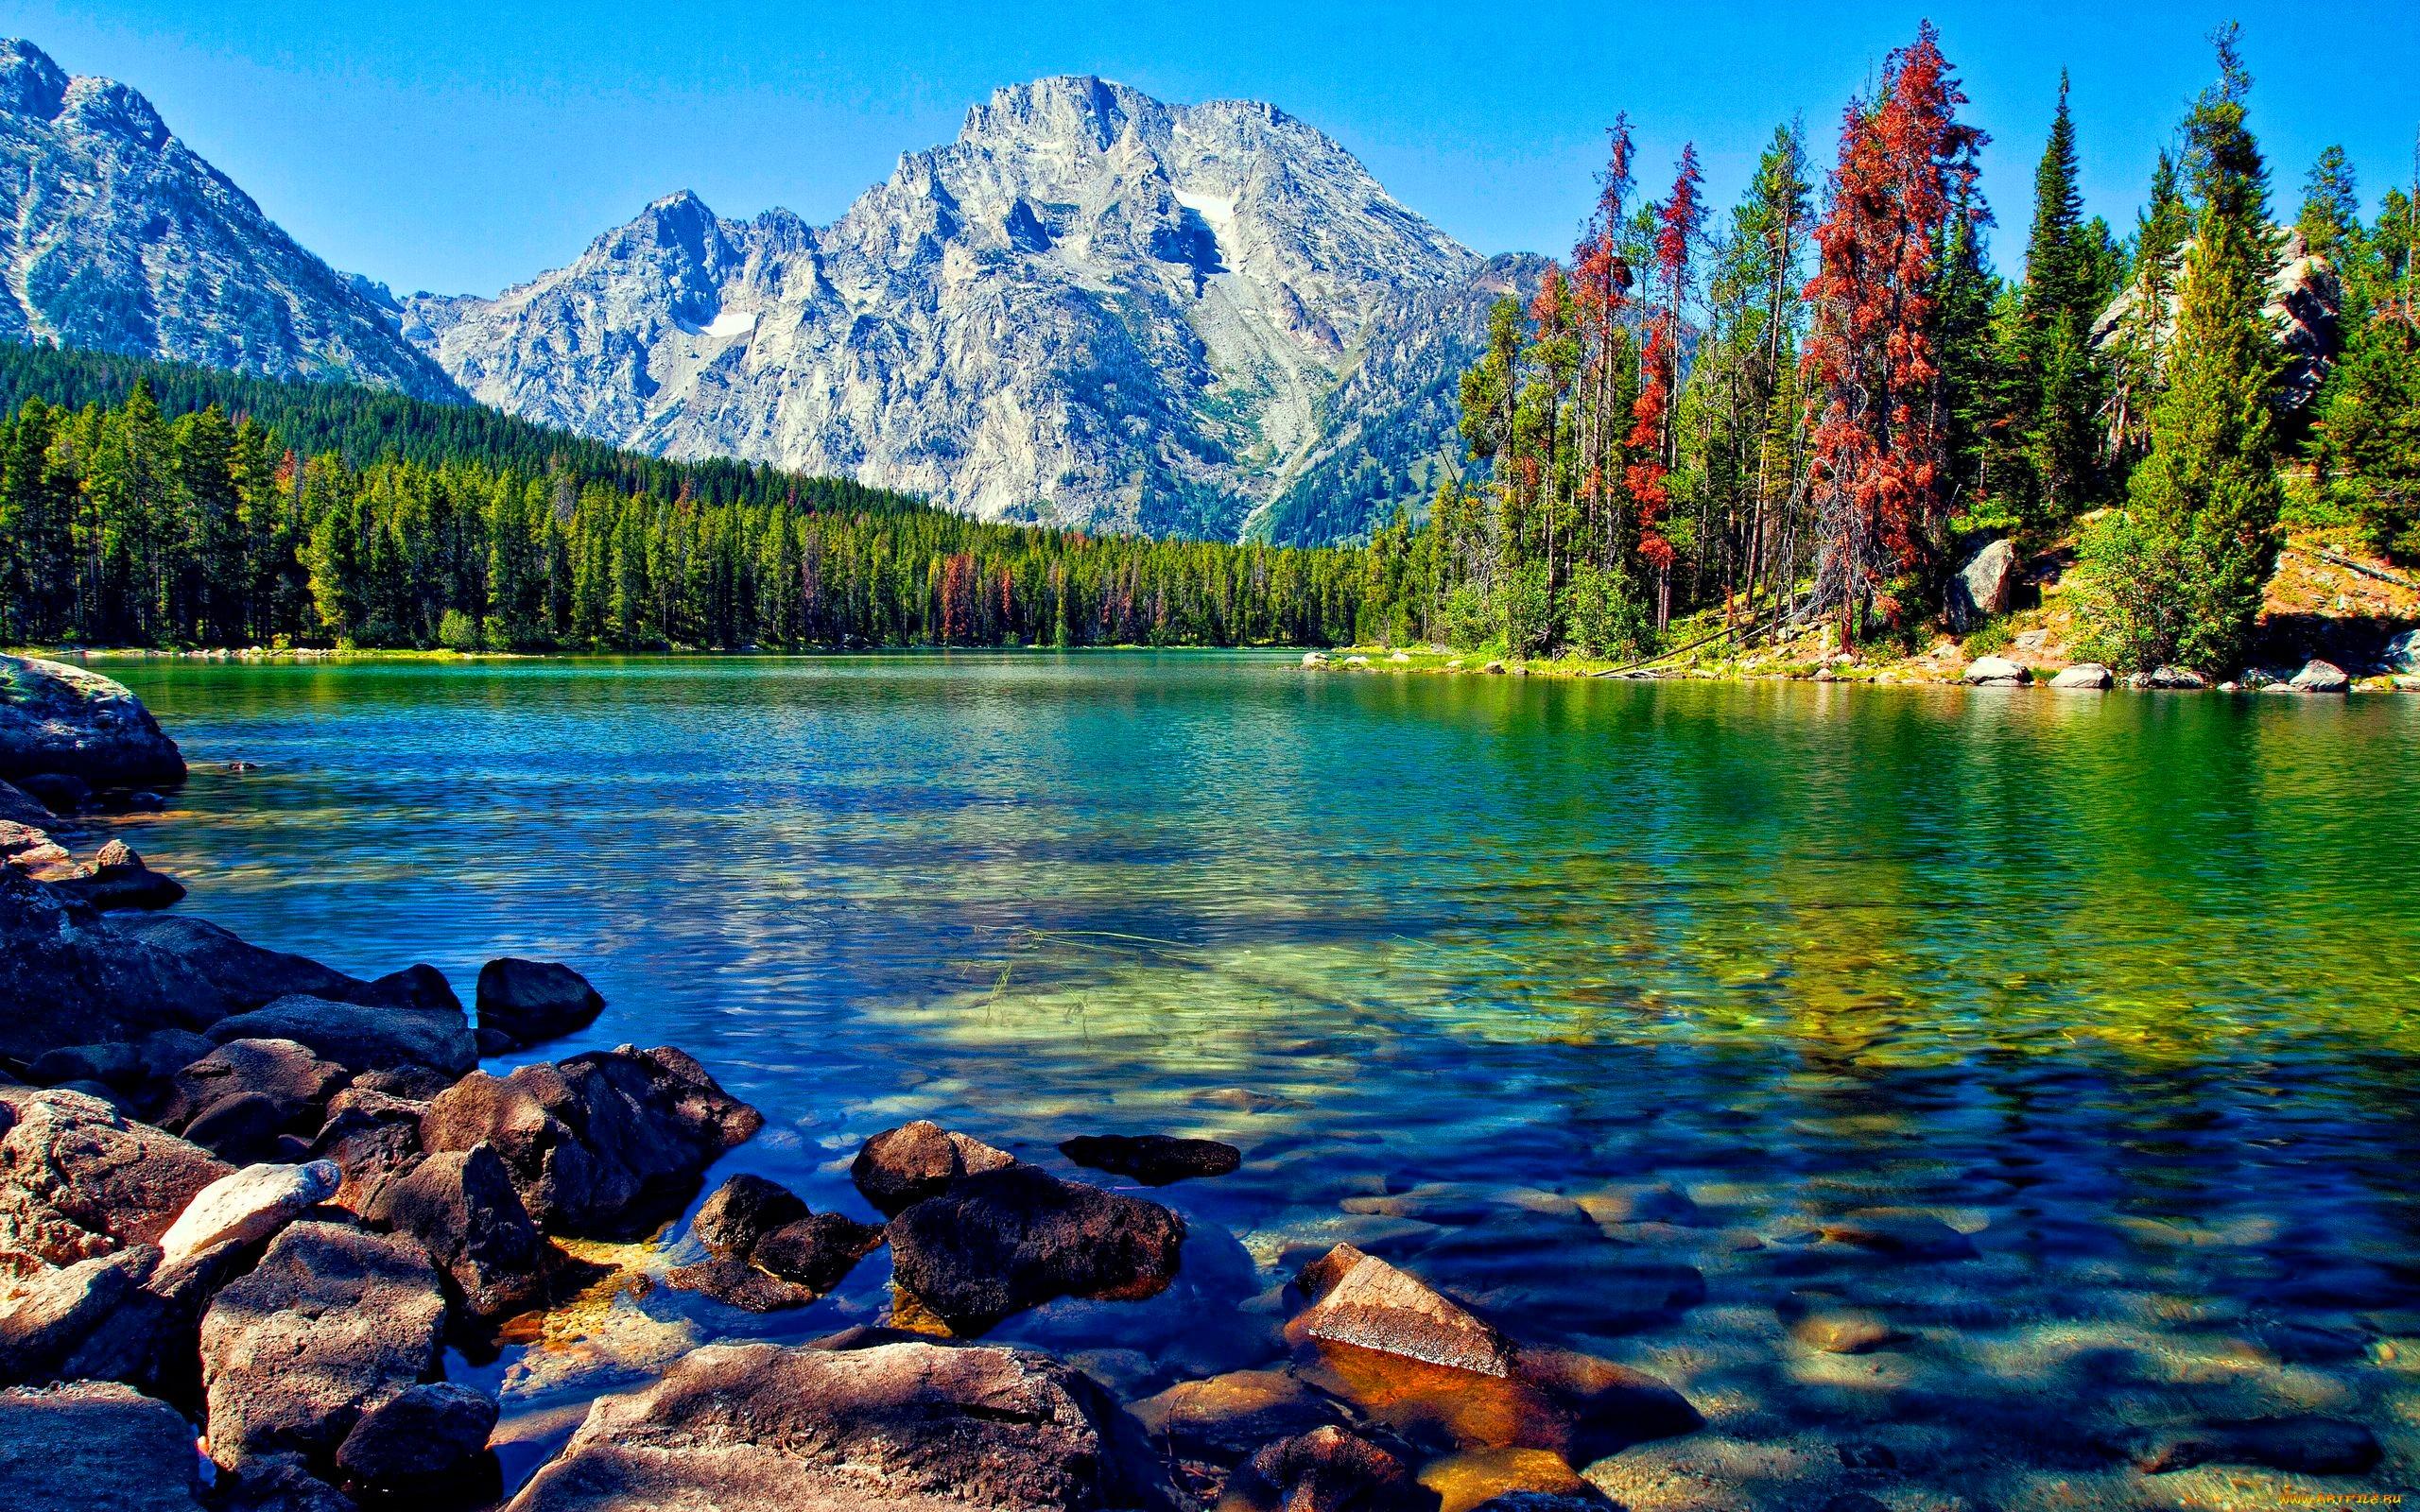 Beautiful inspiring photo of lake